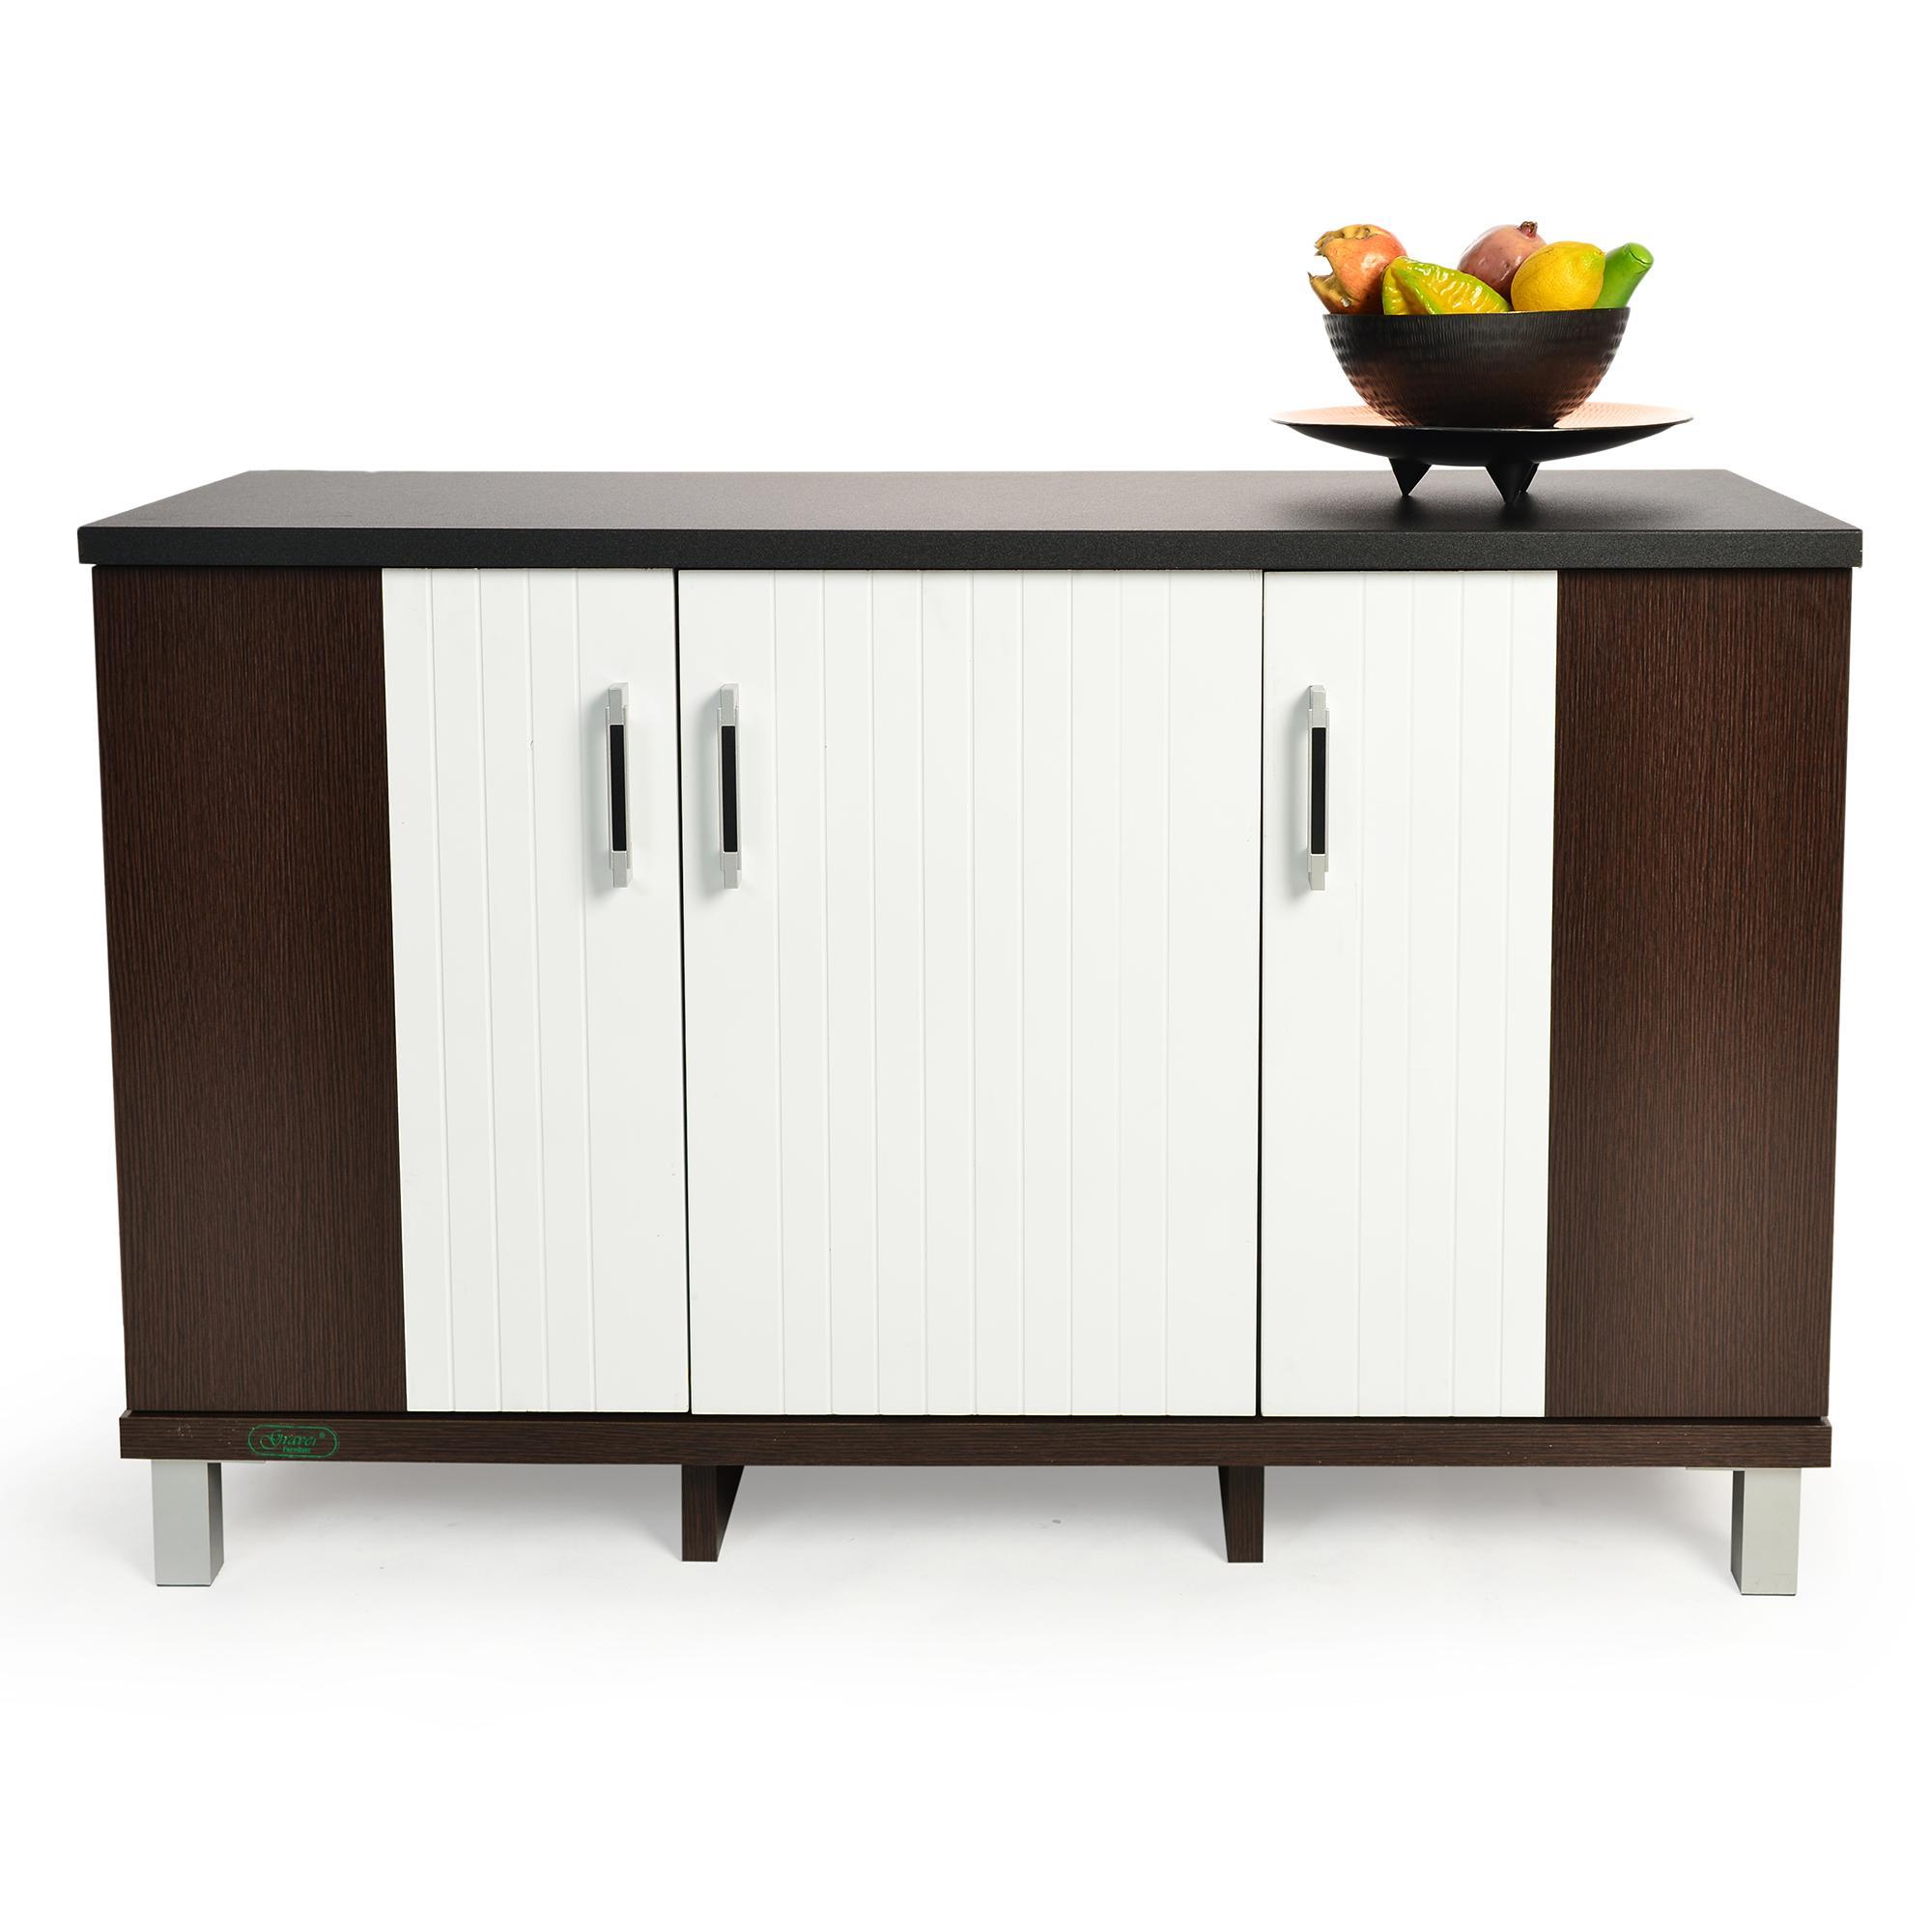 Graver kitchen set bawah rak lemari dapur ksb 2643 khusus jabodetabek